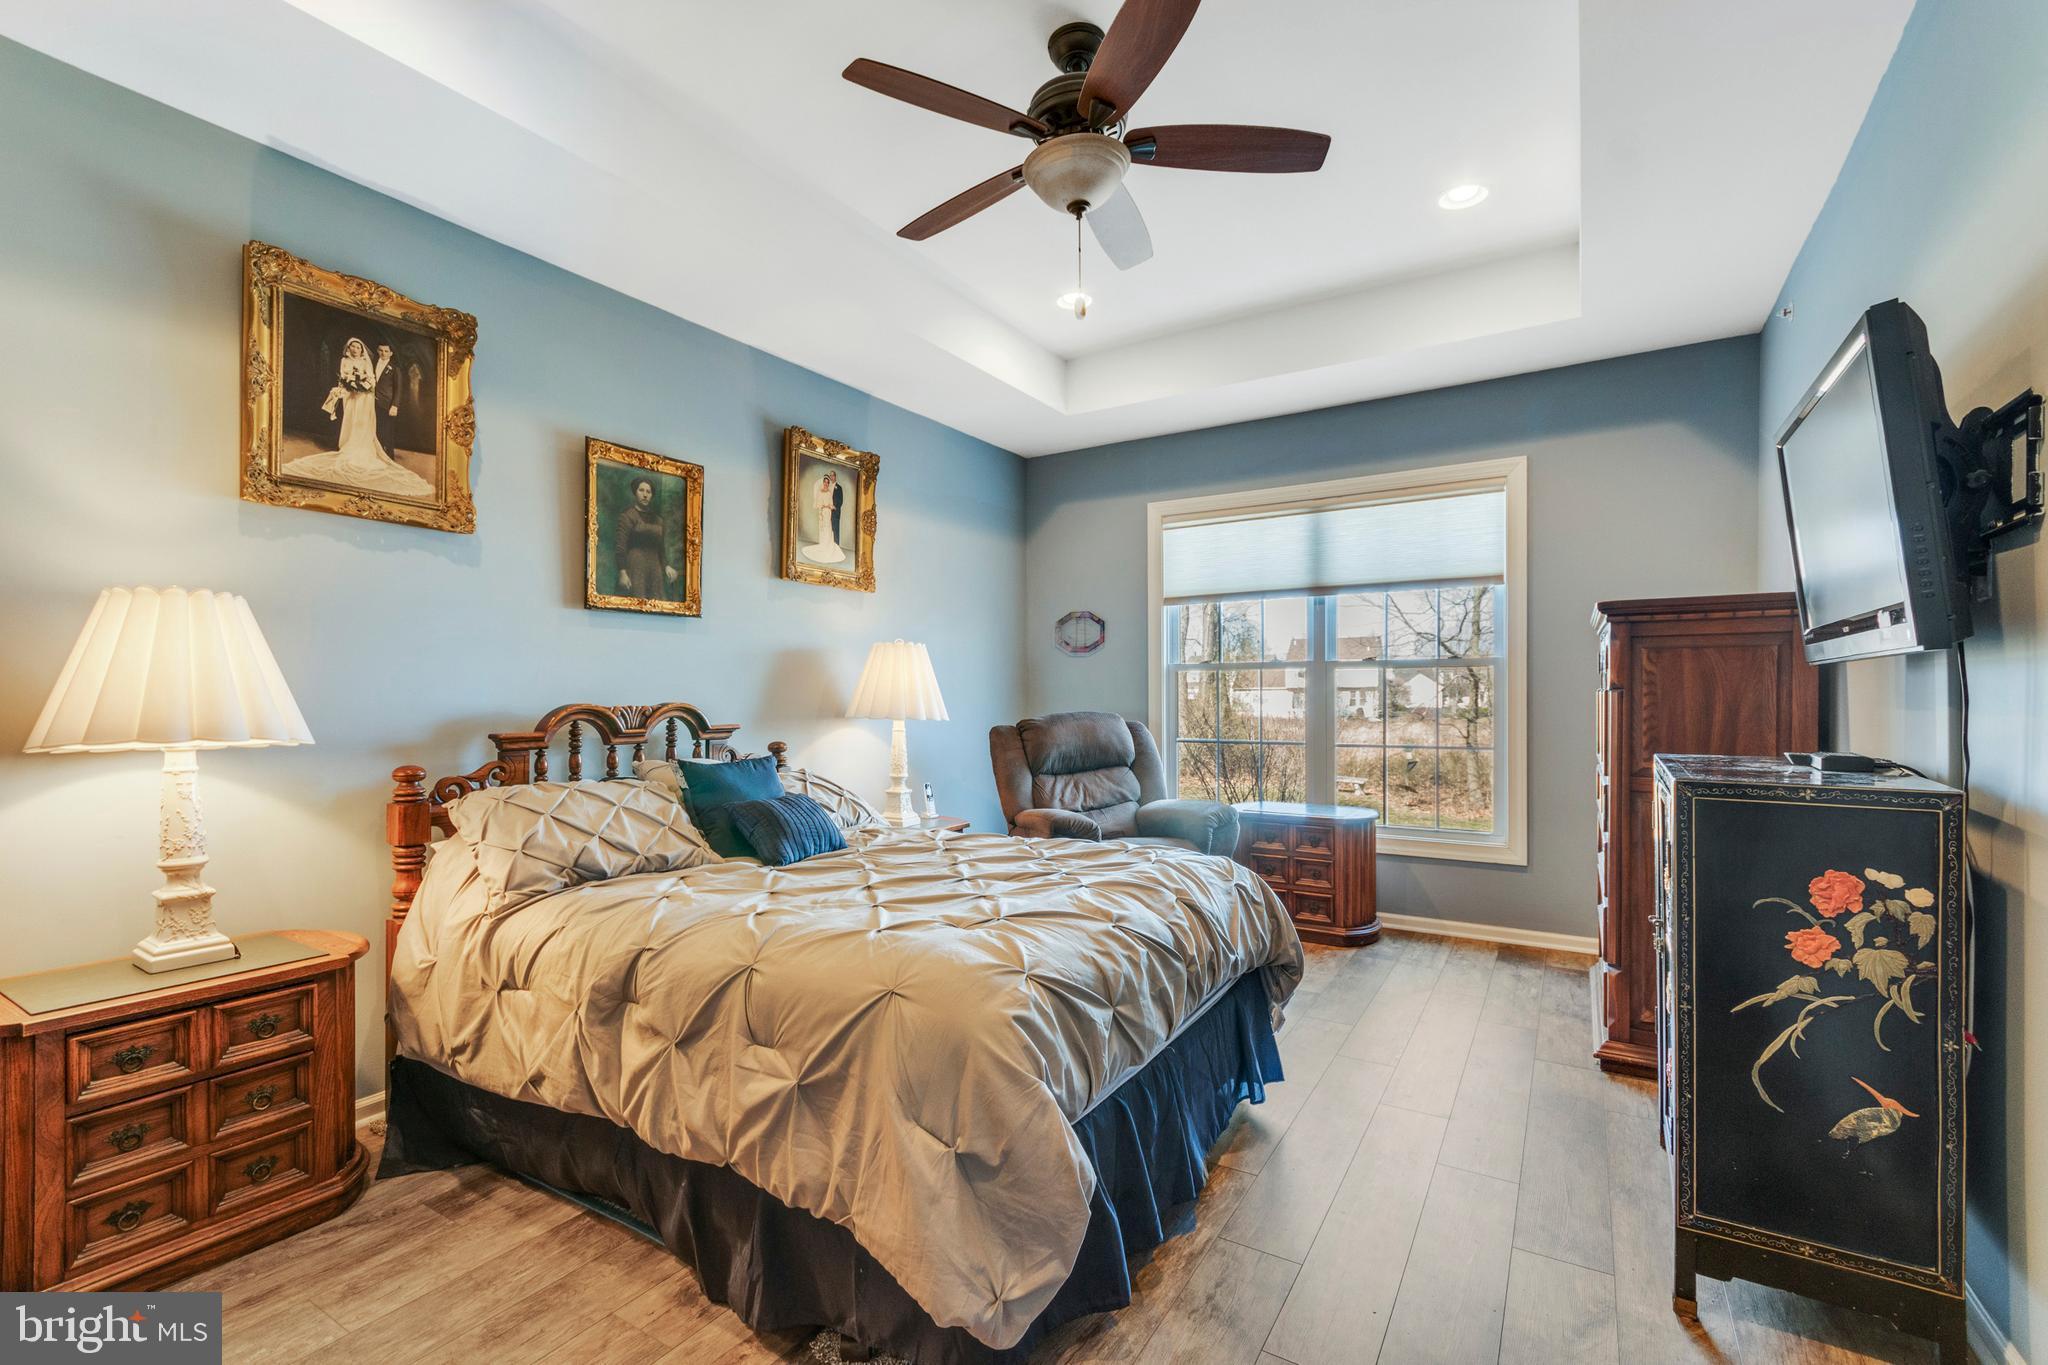 103 EISENHOWER LANE, NORTH WALES, Pennsylvania 19454, 3 Bedrooms Bedrooms, ,3 BathroomsBathrooms,Condominium,For Sale,103 EISENHOWER LANE,PAMC685904